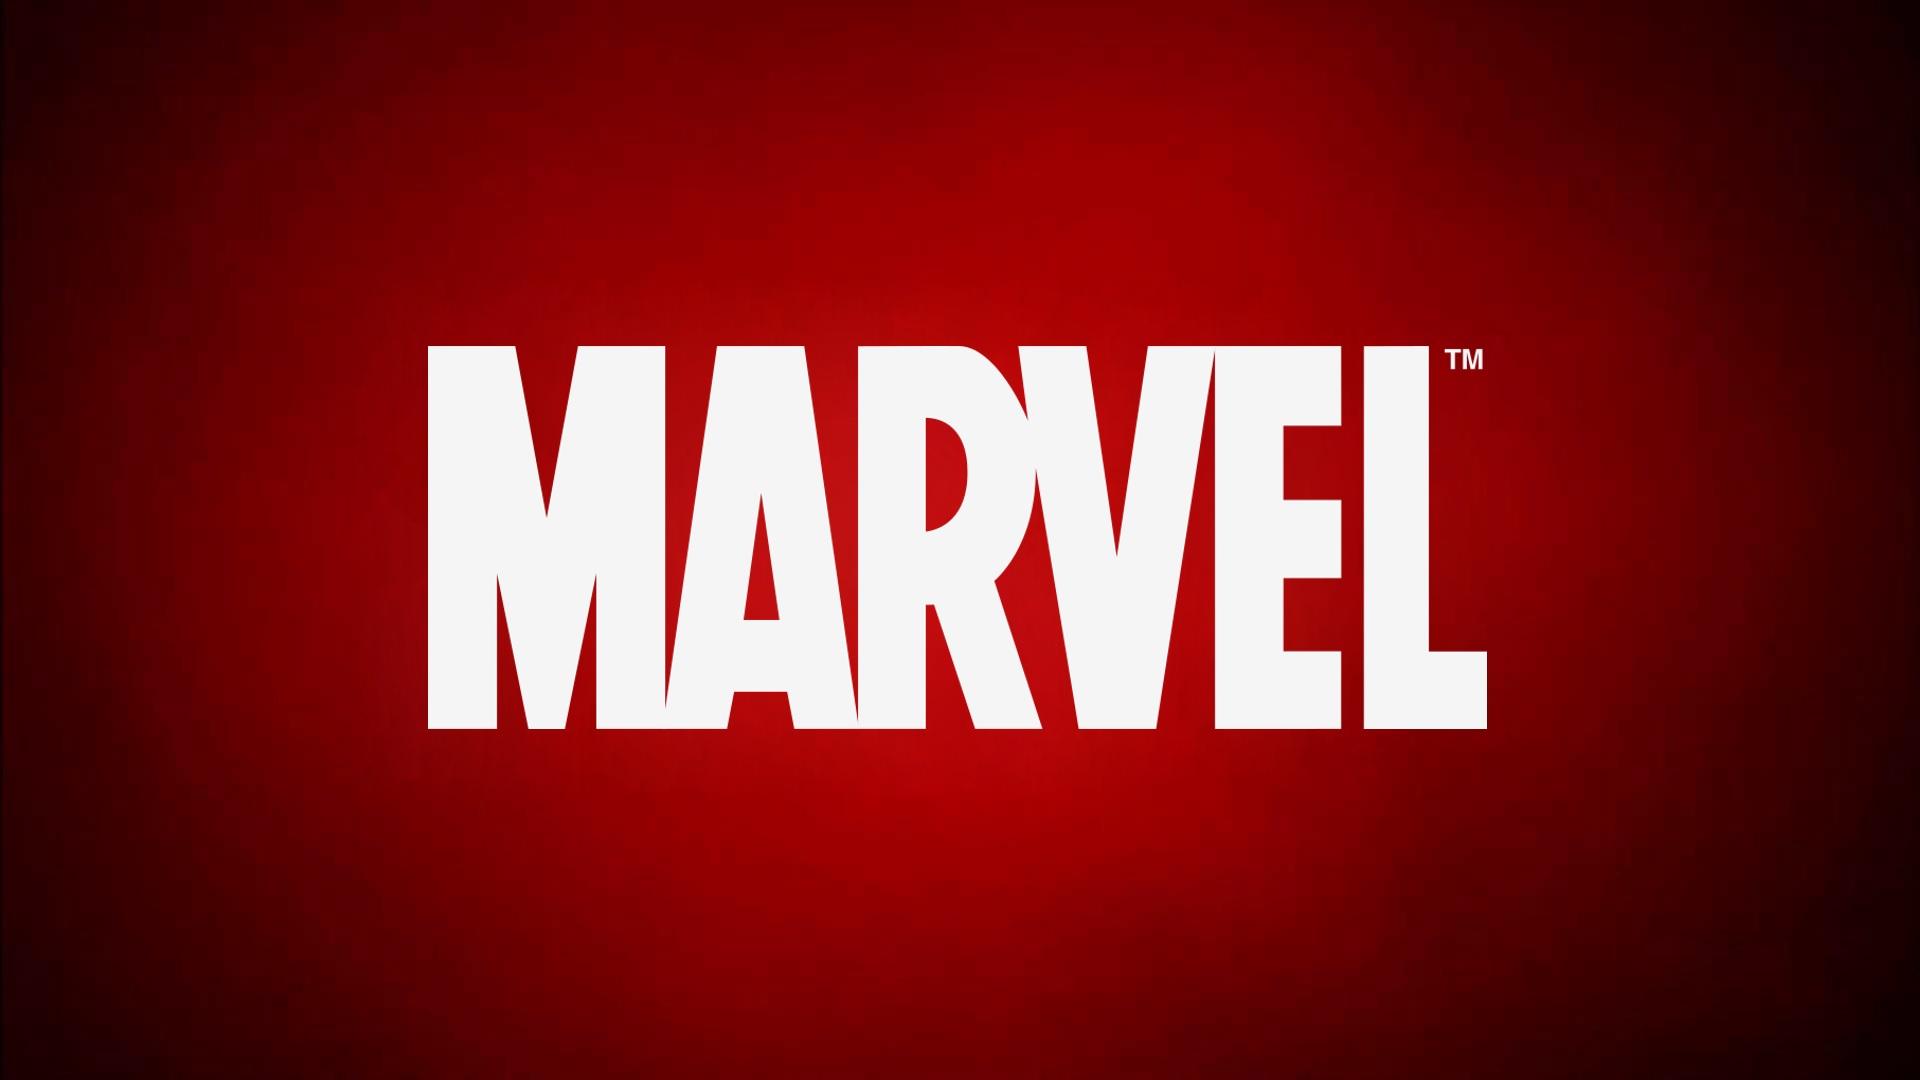 Marvel Studios/On-screen Logos